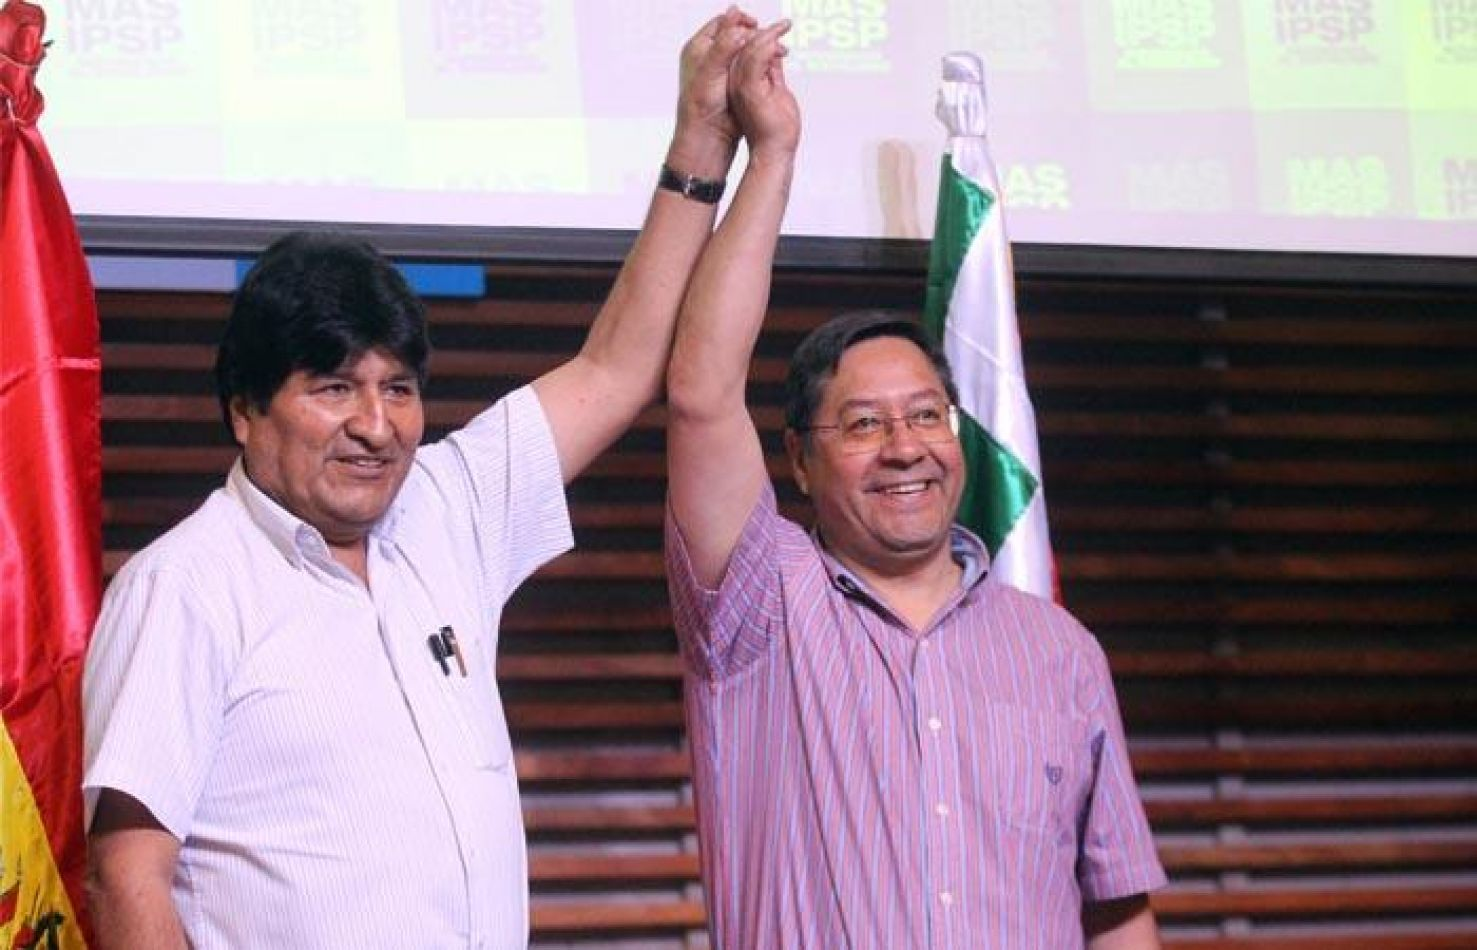 Foto: Bolivia.com. Evo Morales junto a Luis Arce